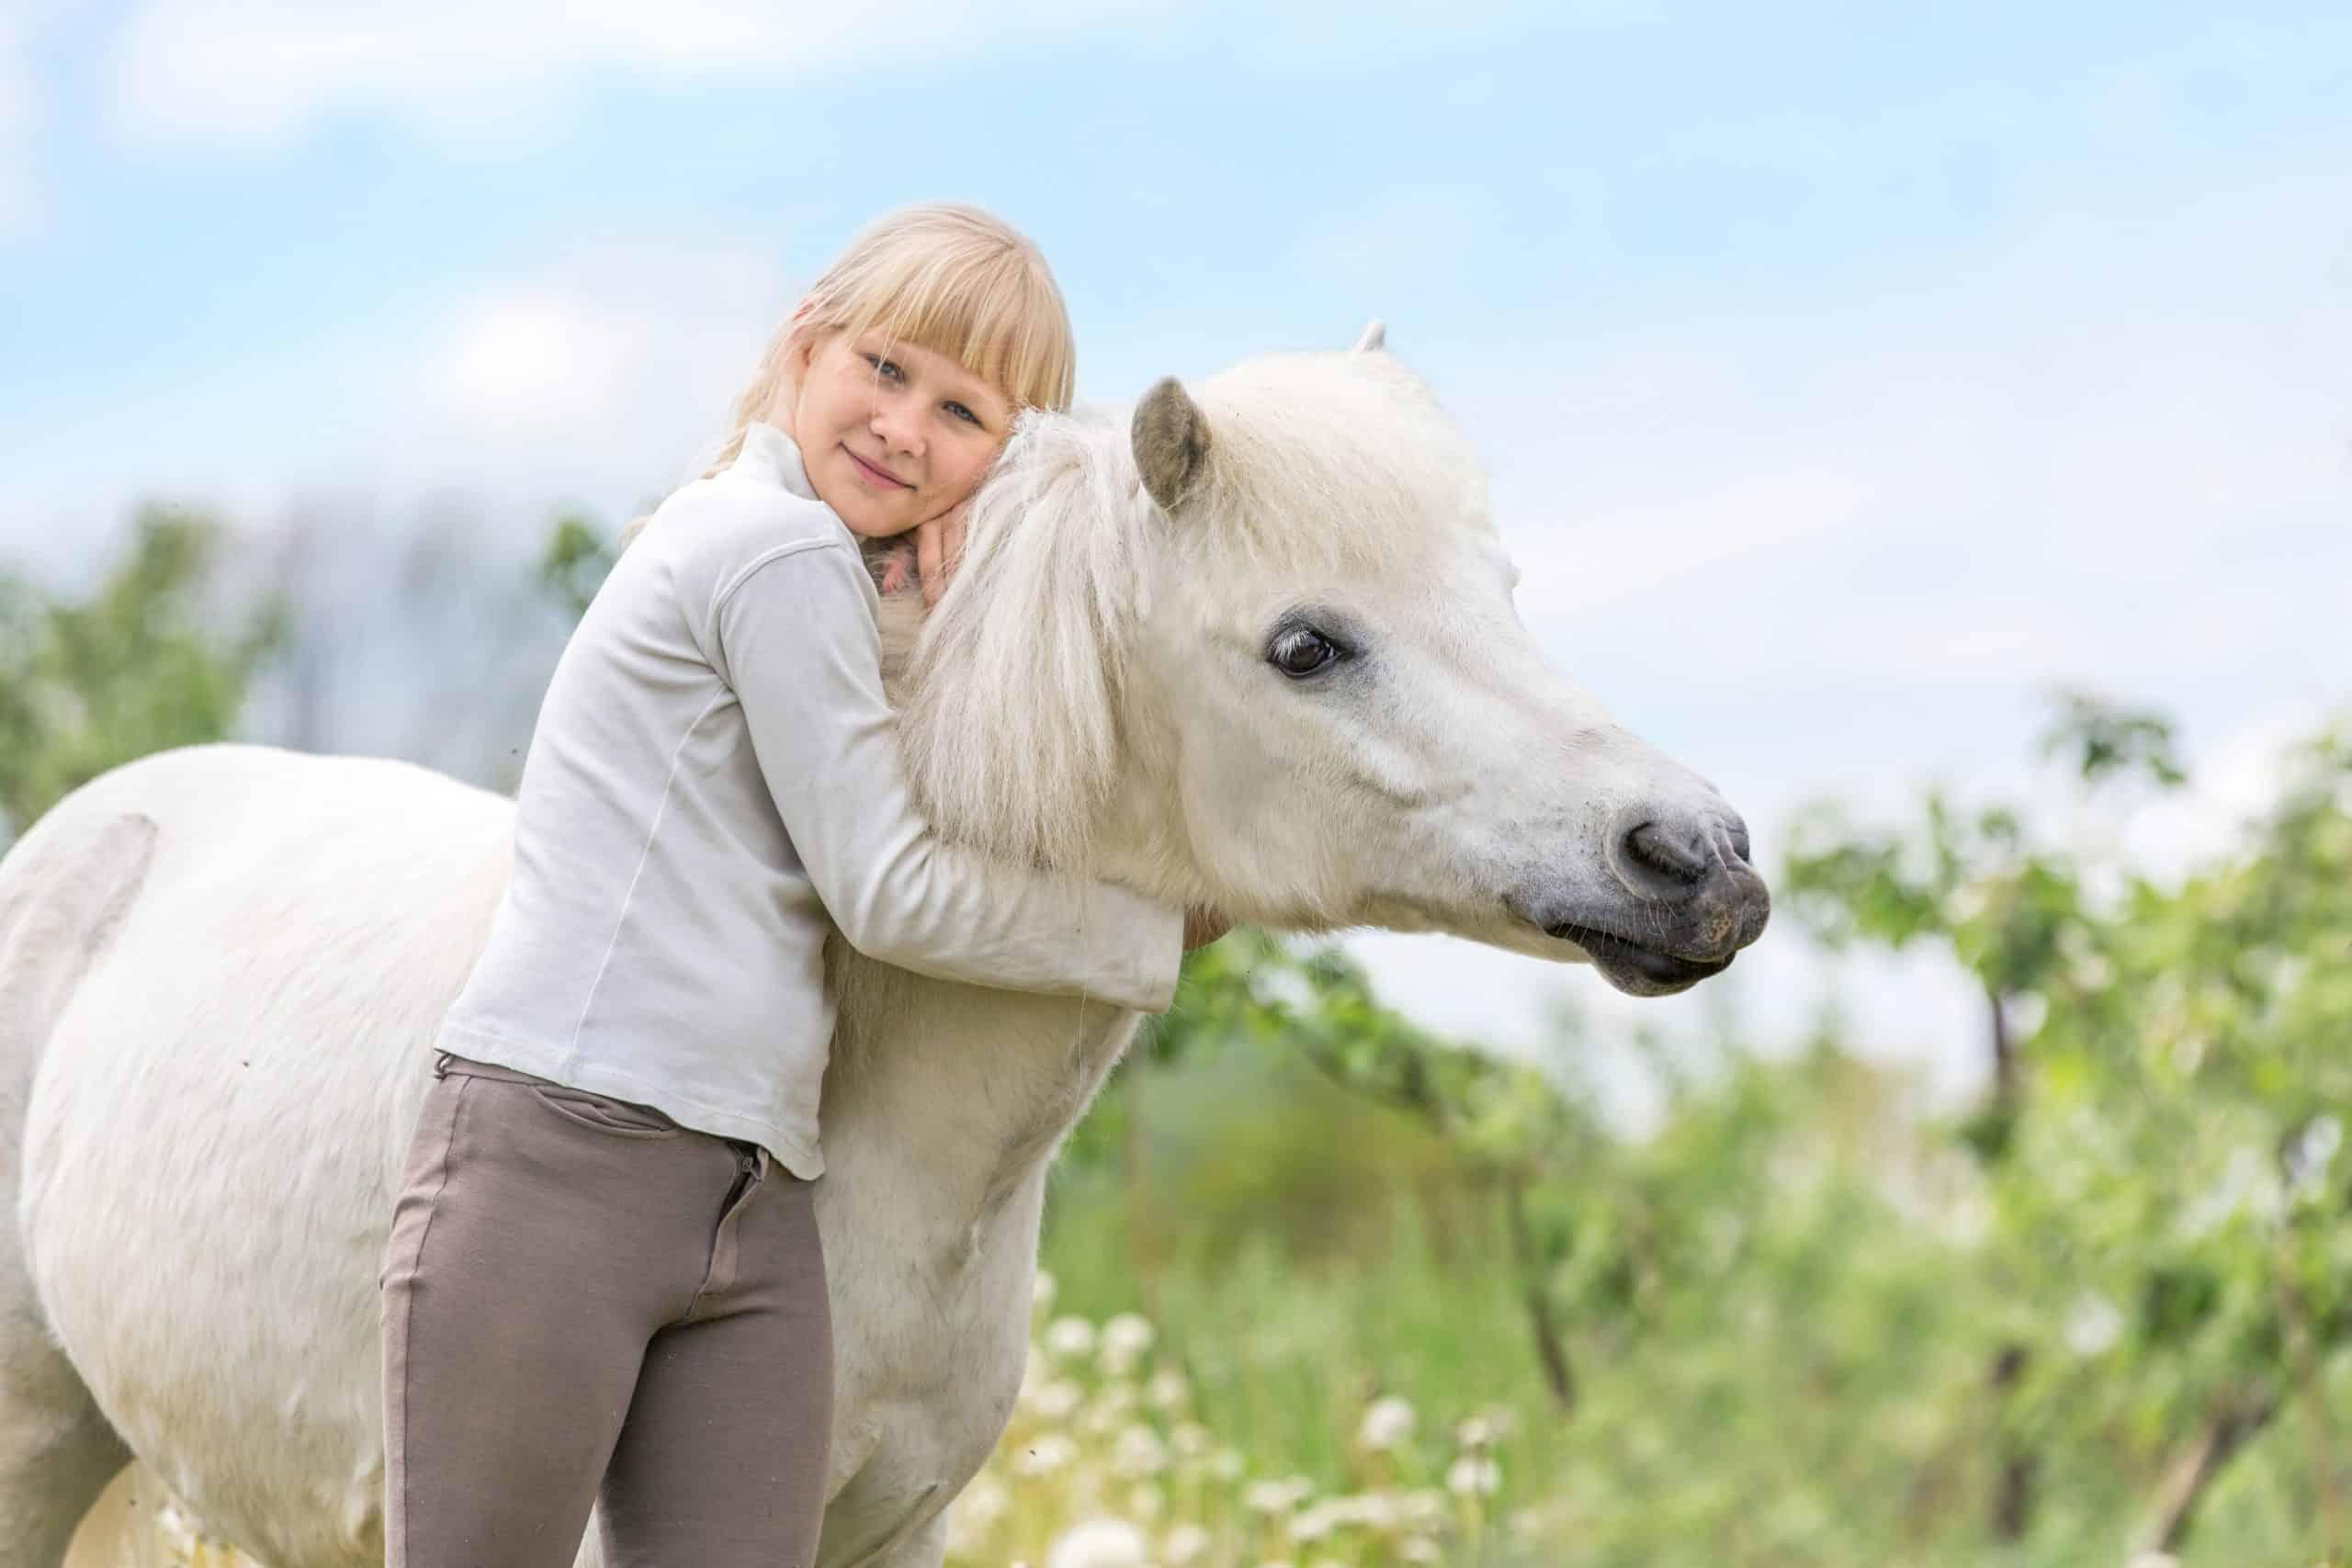 Happy young girl embracing white shetland pony.